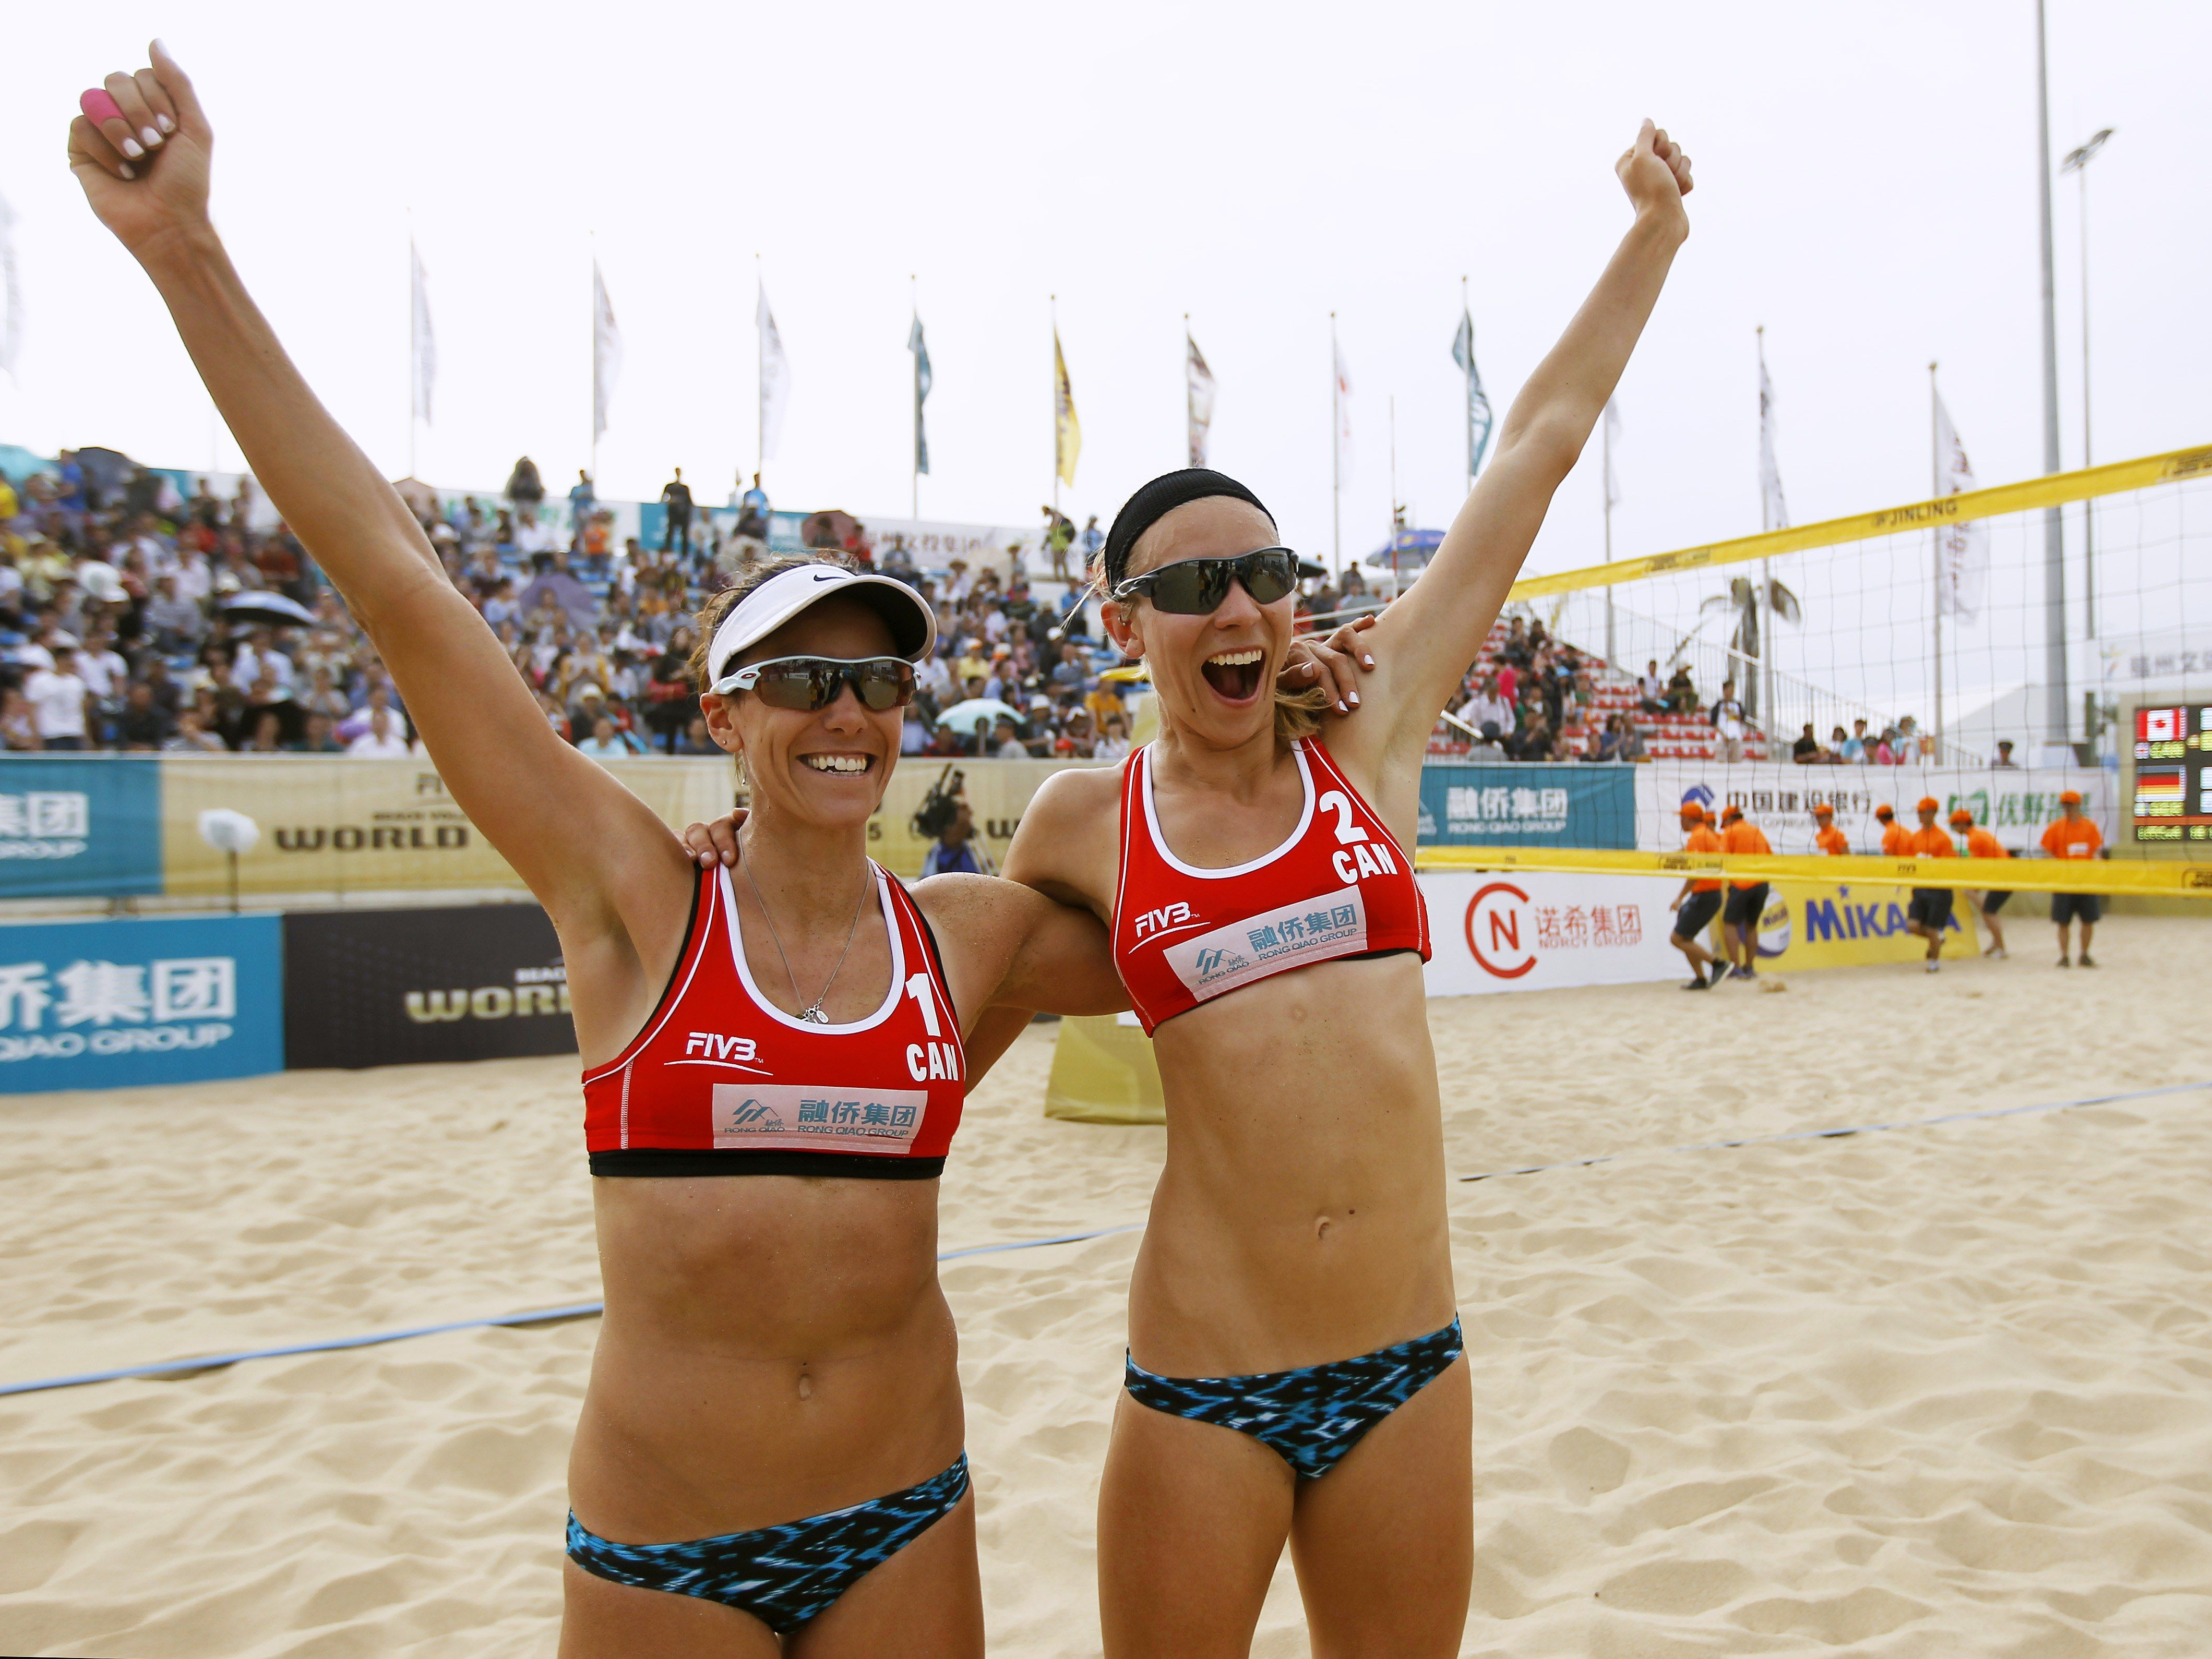 Beach volleyball team bikini